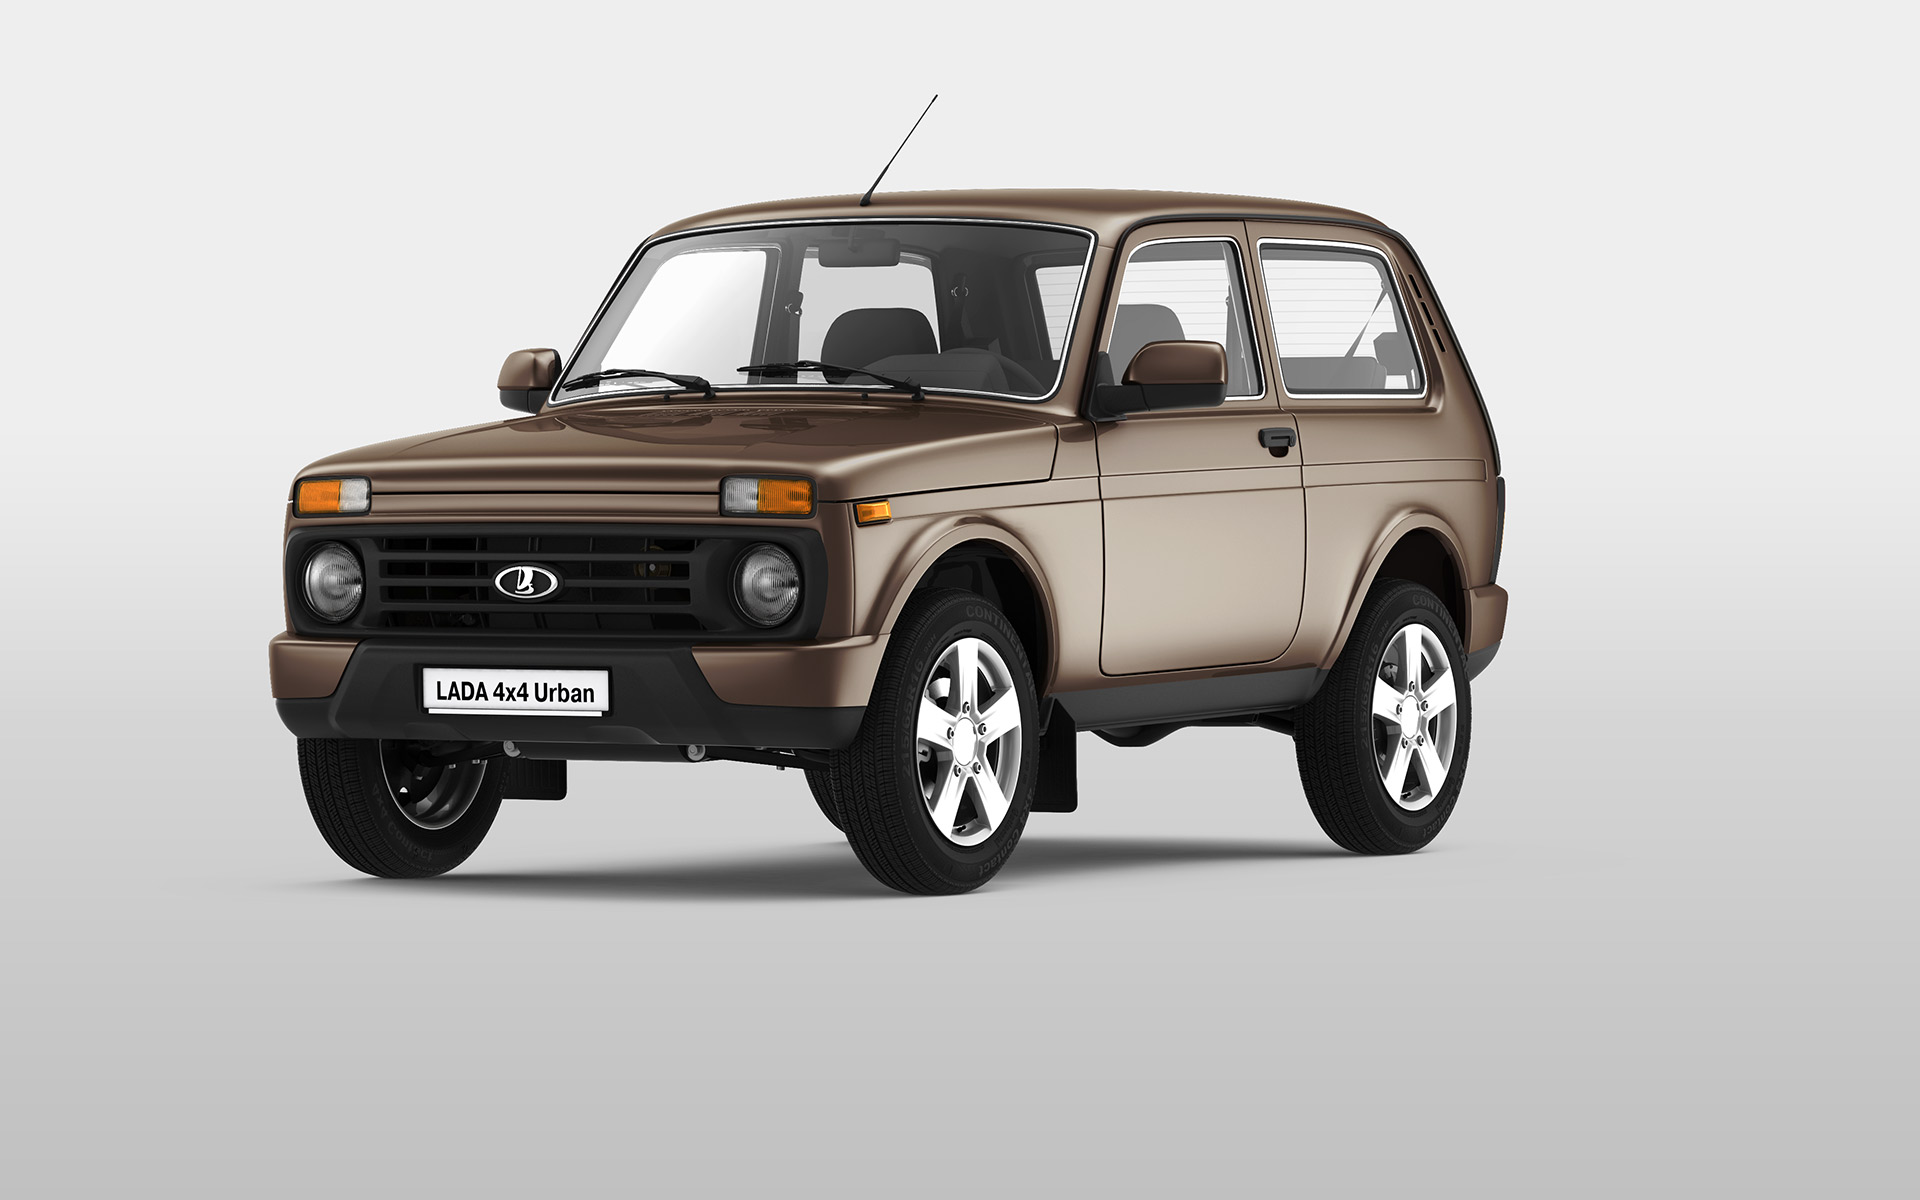 Lada Urban 4x4: technical characteristics, description, photo